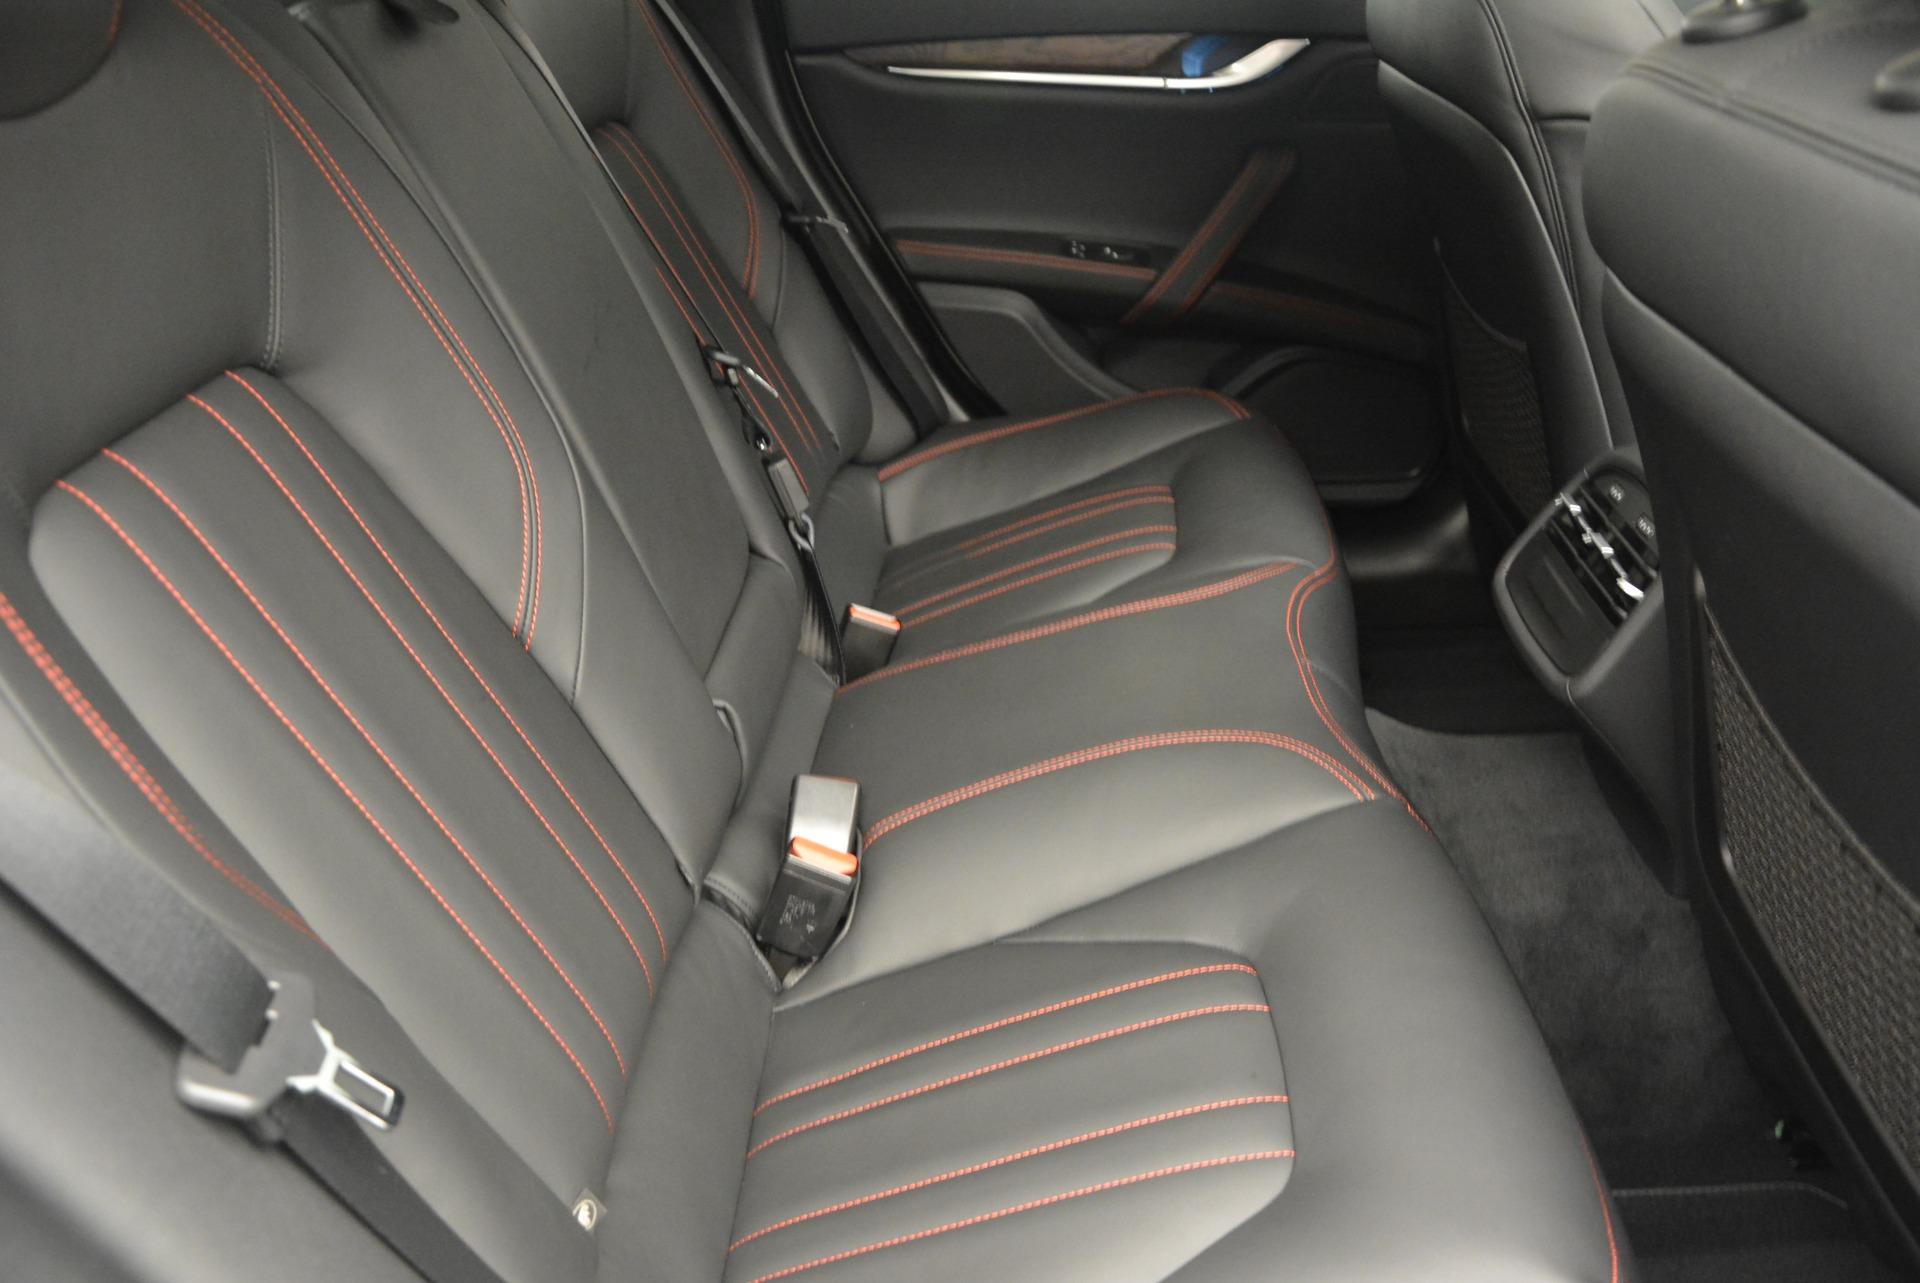 Used 2015 Maserati Ghibli S Q4 For Sale In Westport, CT 2070_p21